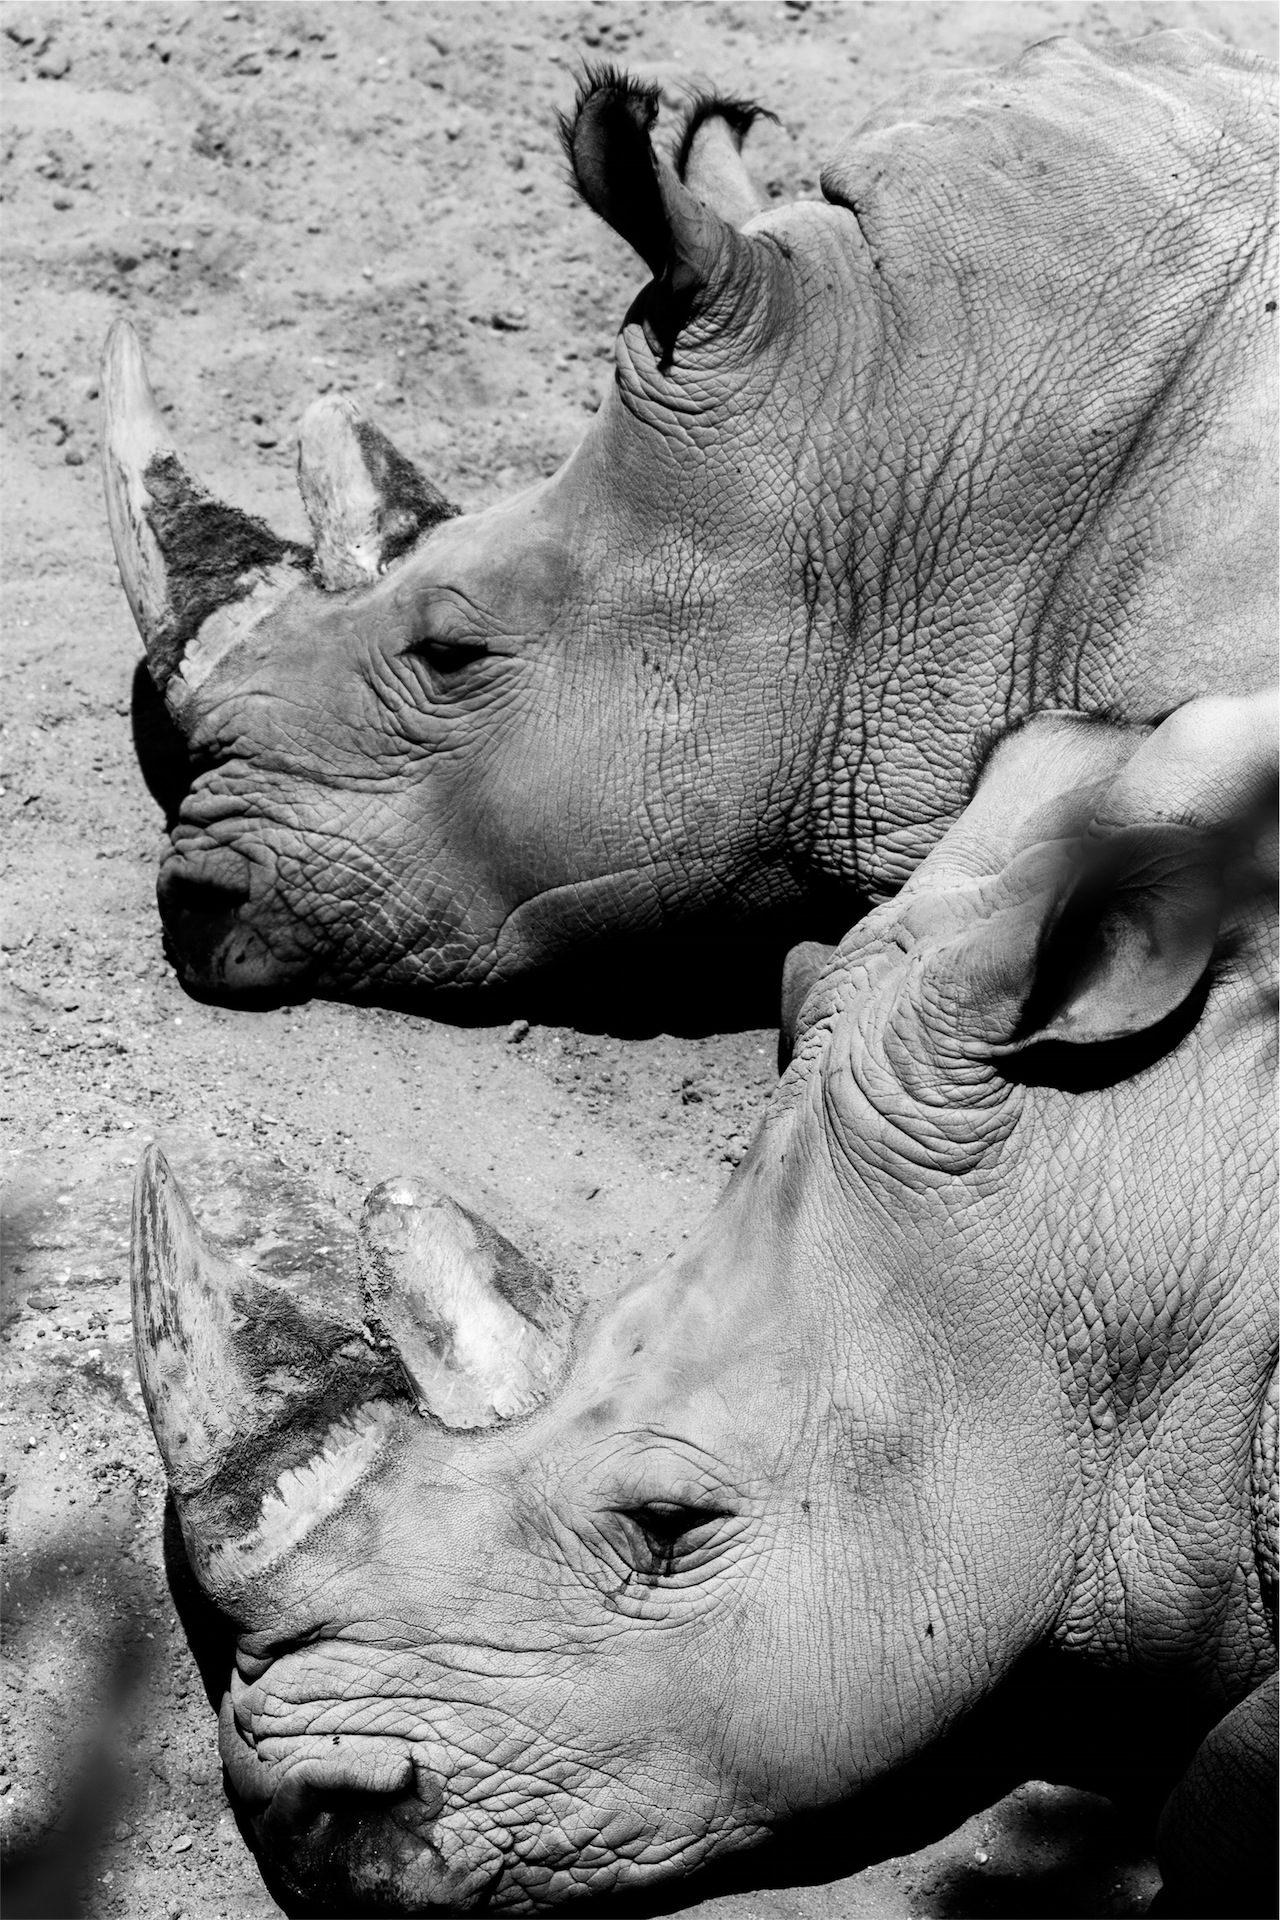 rinocerontes, カップル, 角, ヘッド, 黒と白の - HD の壁紙 - 教授-falken.com